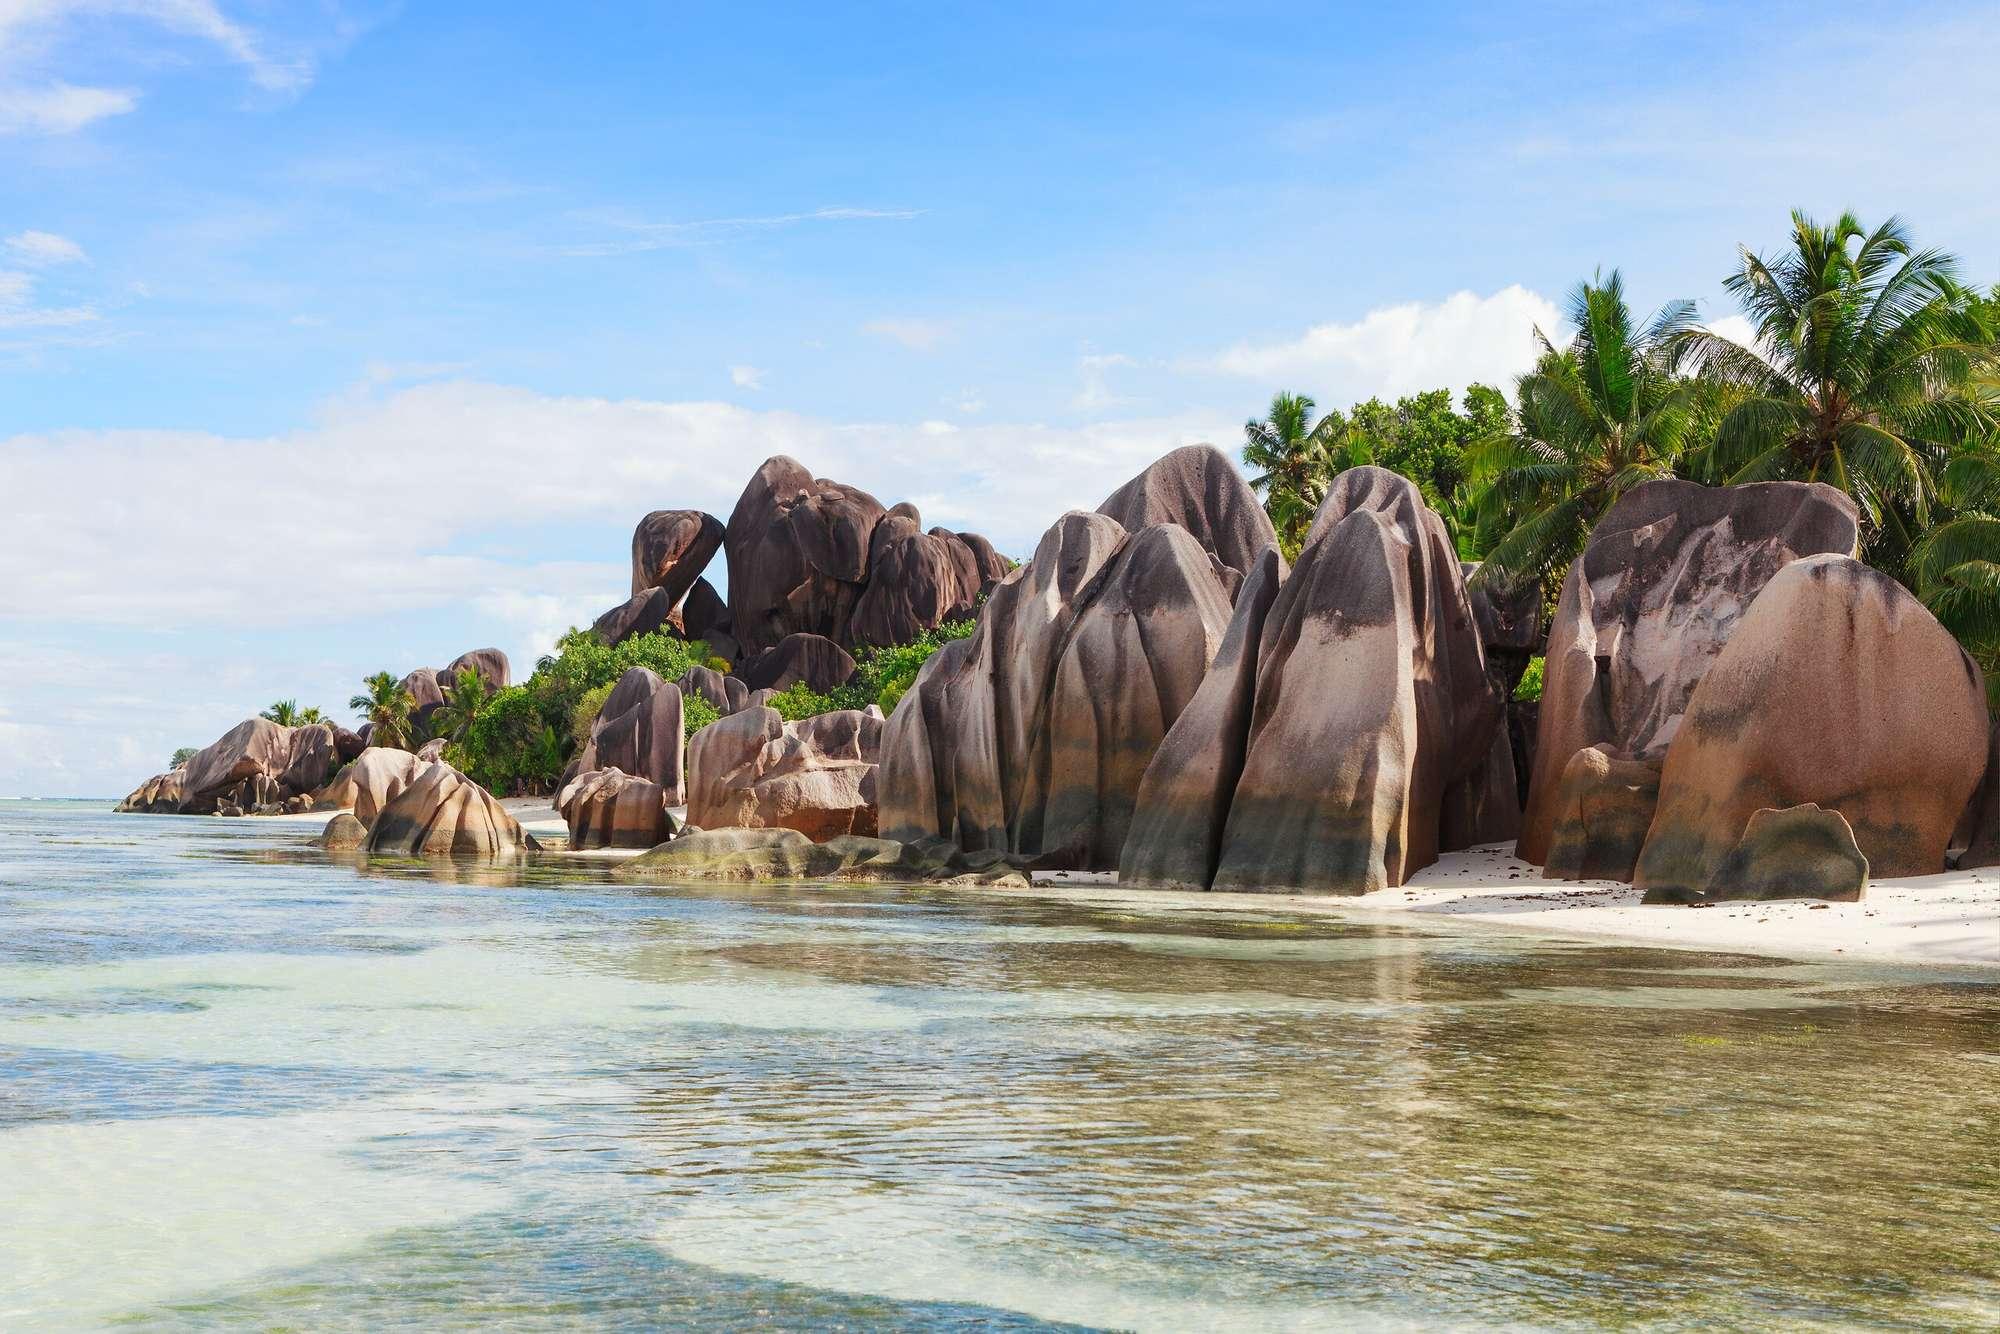 https___ns.clubmed.com_dream_CIRCUITS_DECOUVERTE_Afrique___Ocean_Indien_Seychelles_121048-u3y46dllfh-swhr